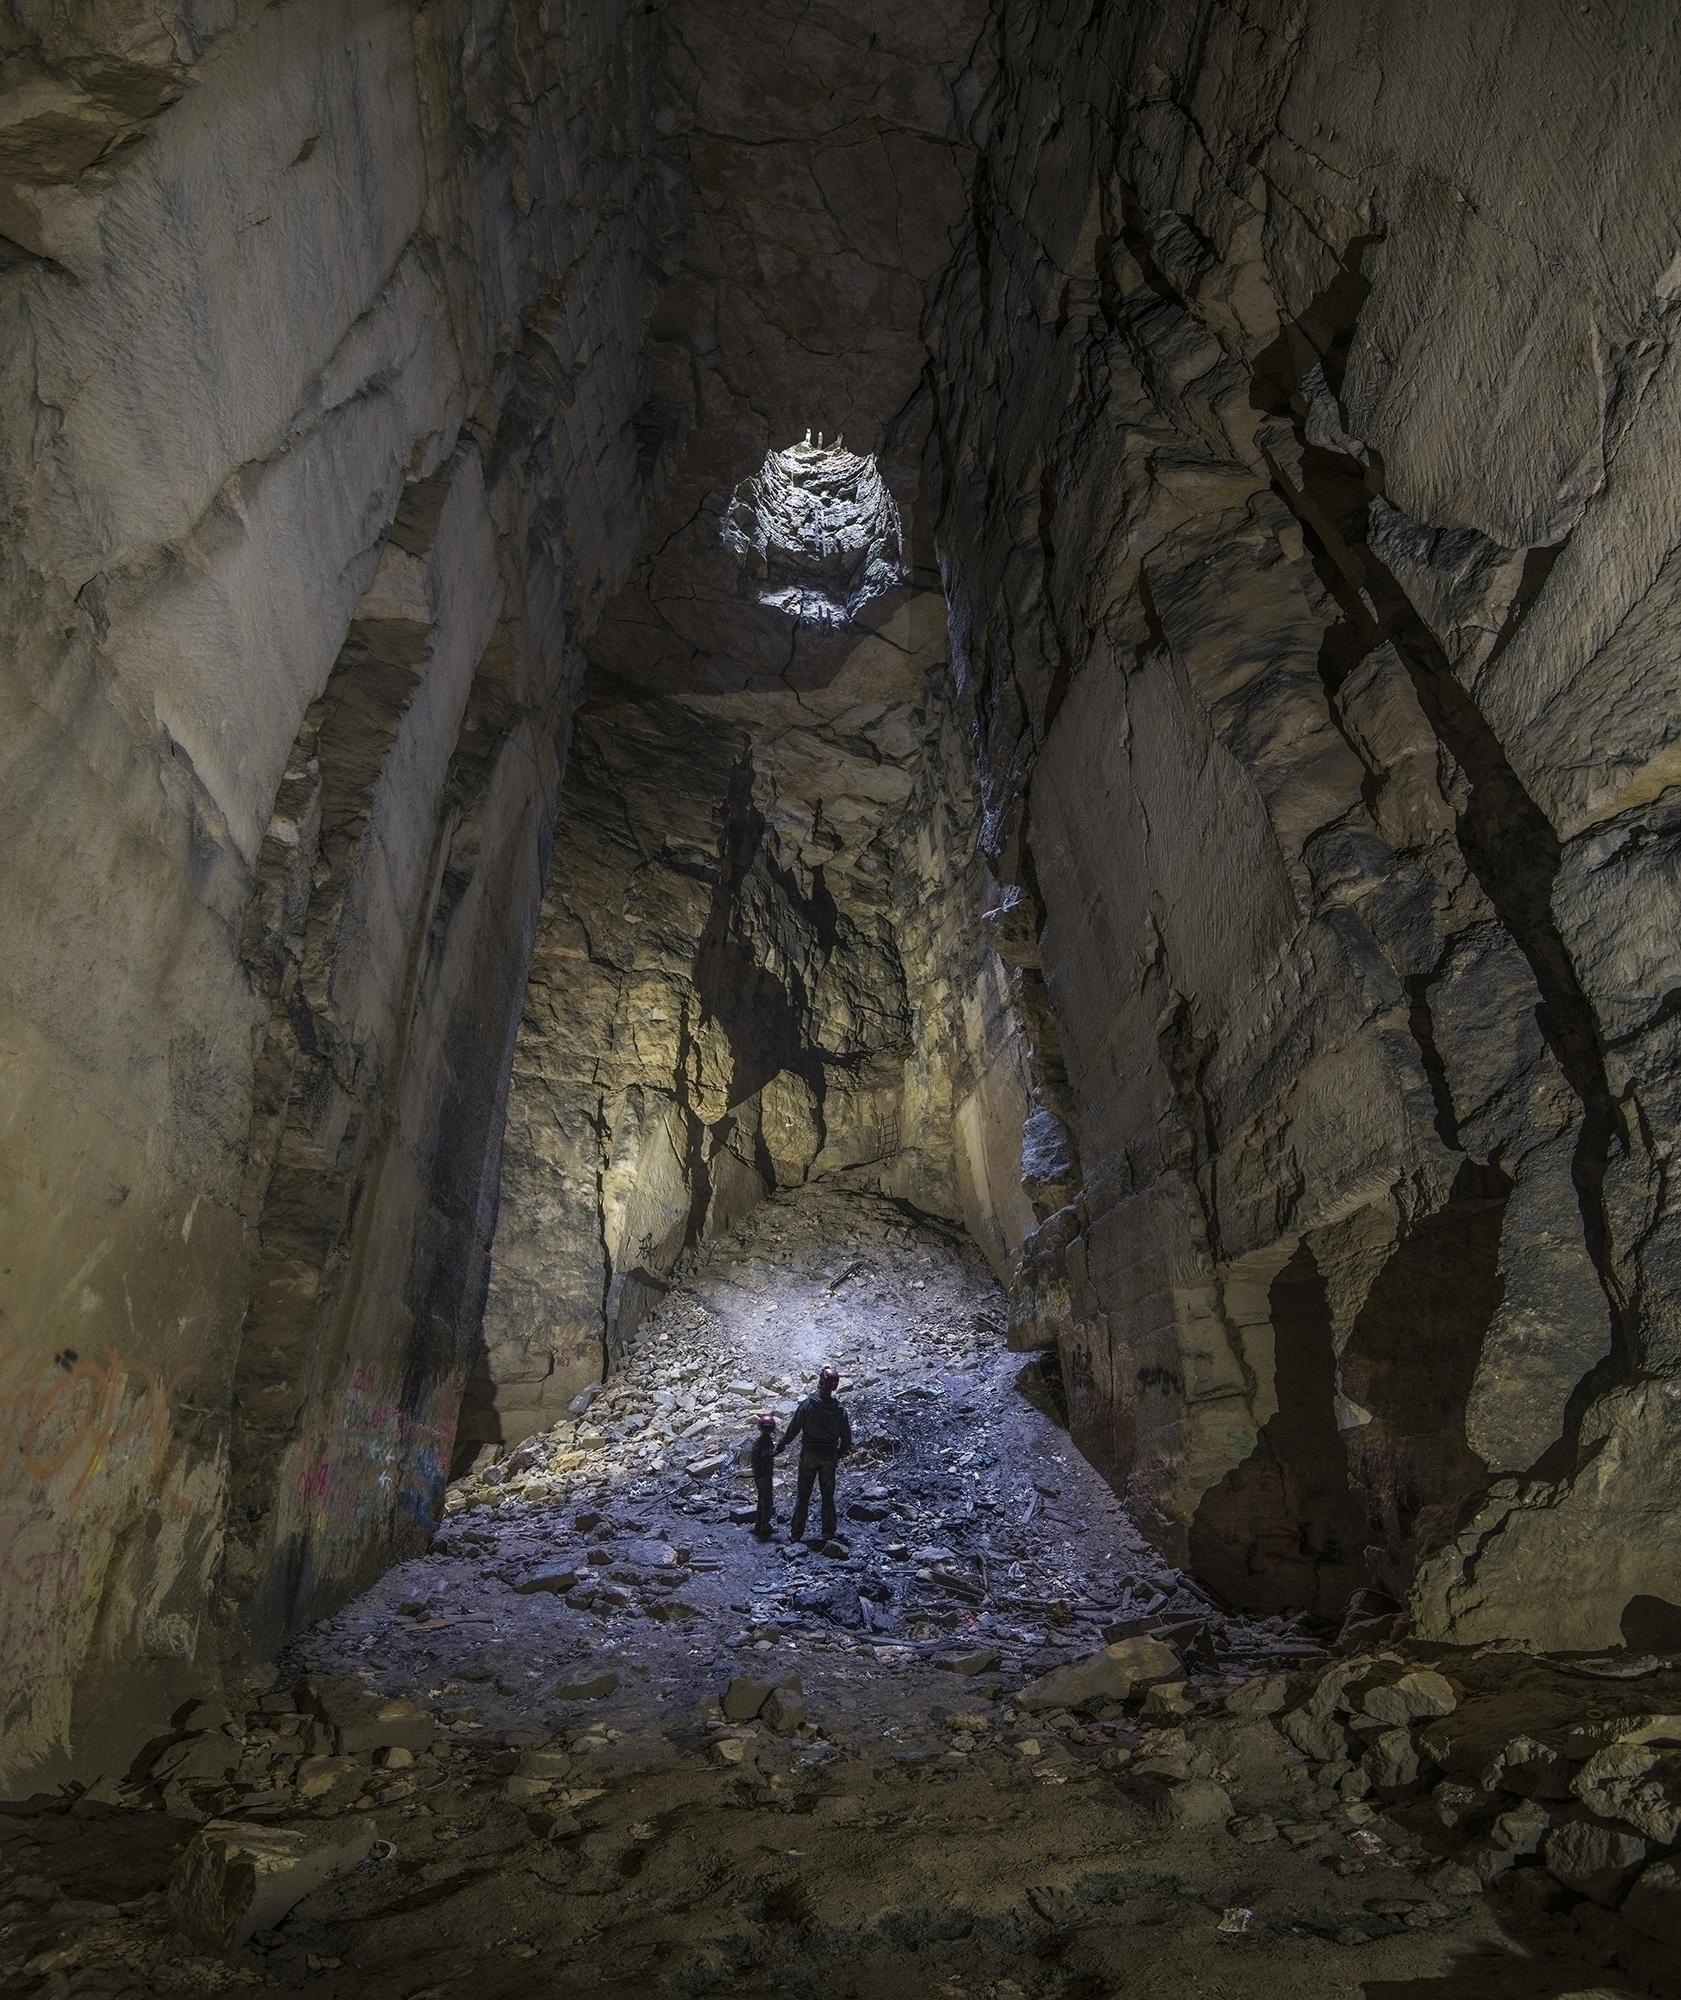 youngest son exploring deep vil - forgottenheritage   ello